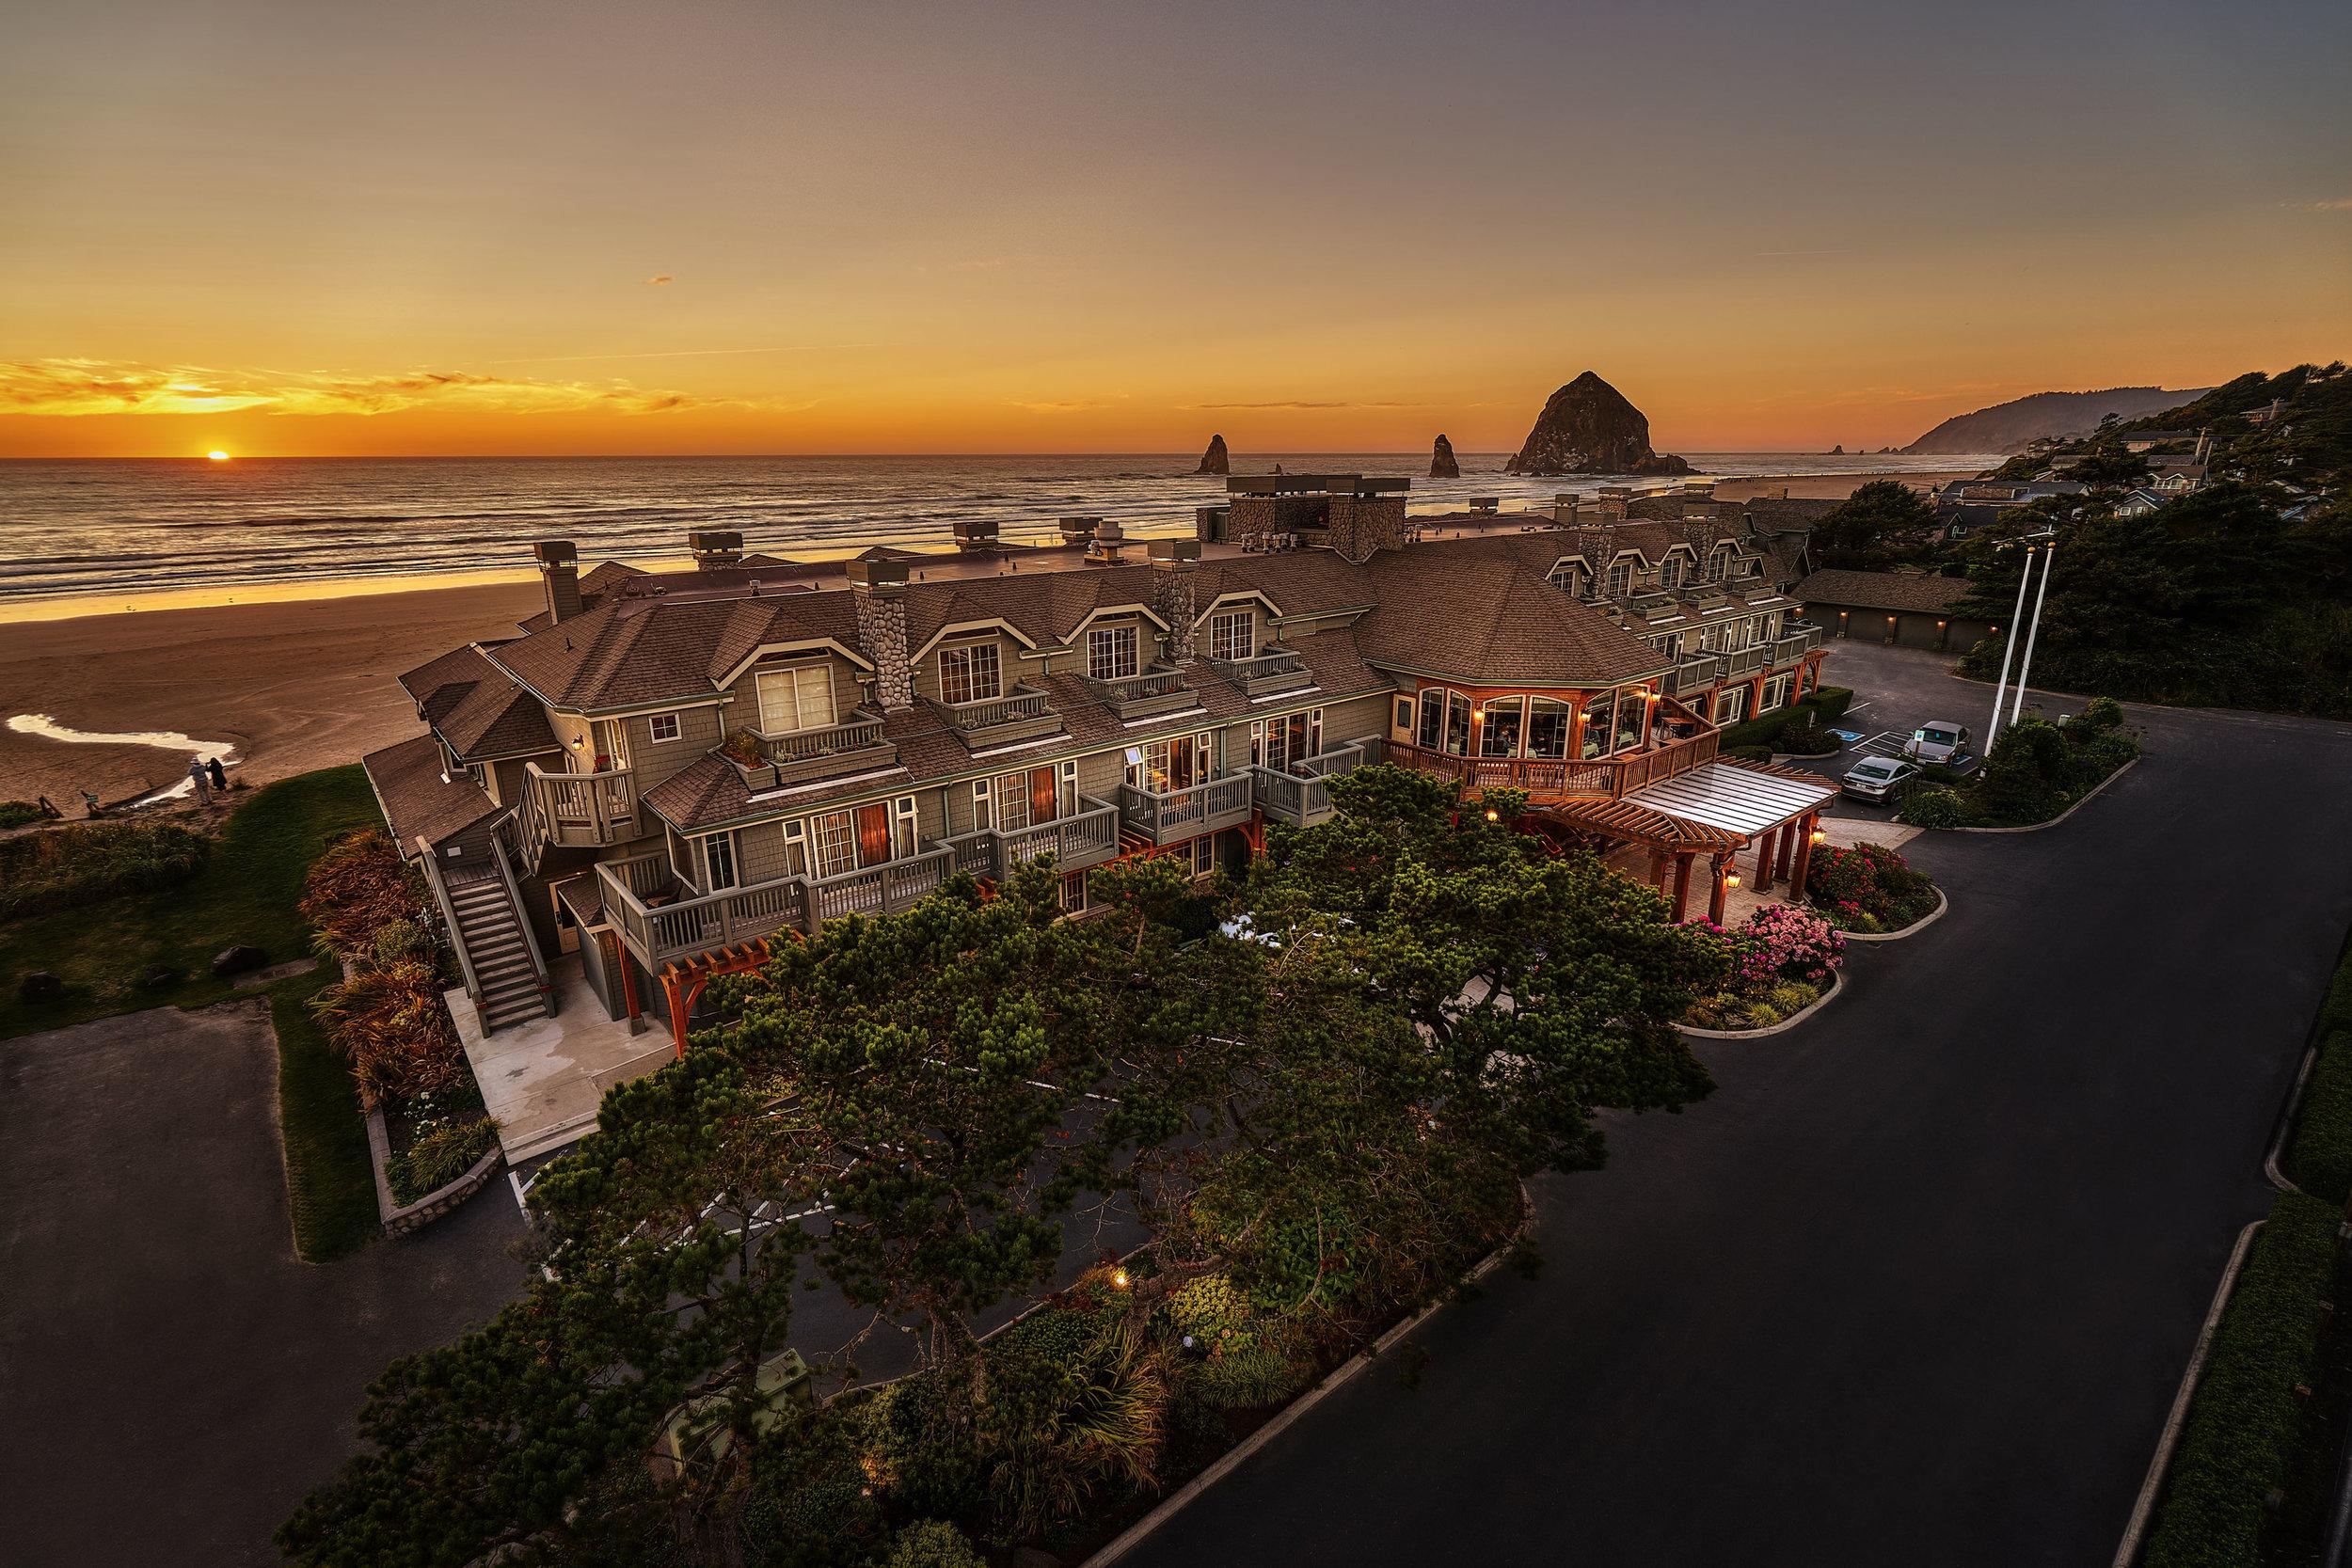 Aerial Photo of the Stephanie Inn at Sunset